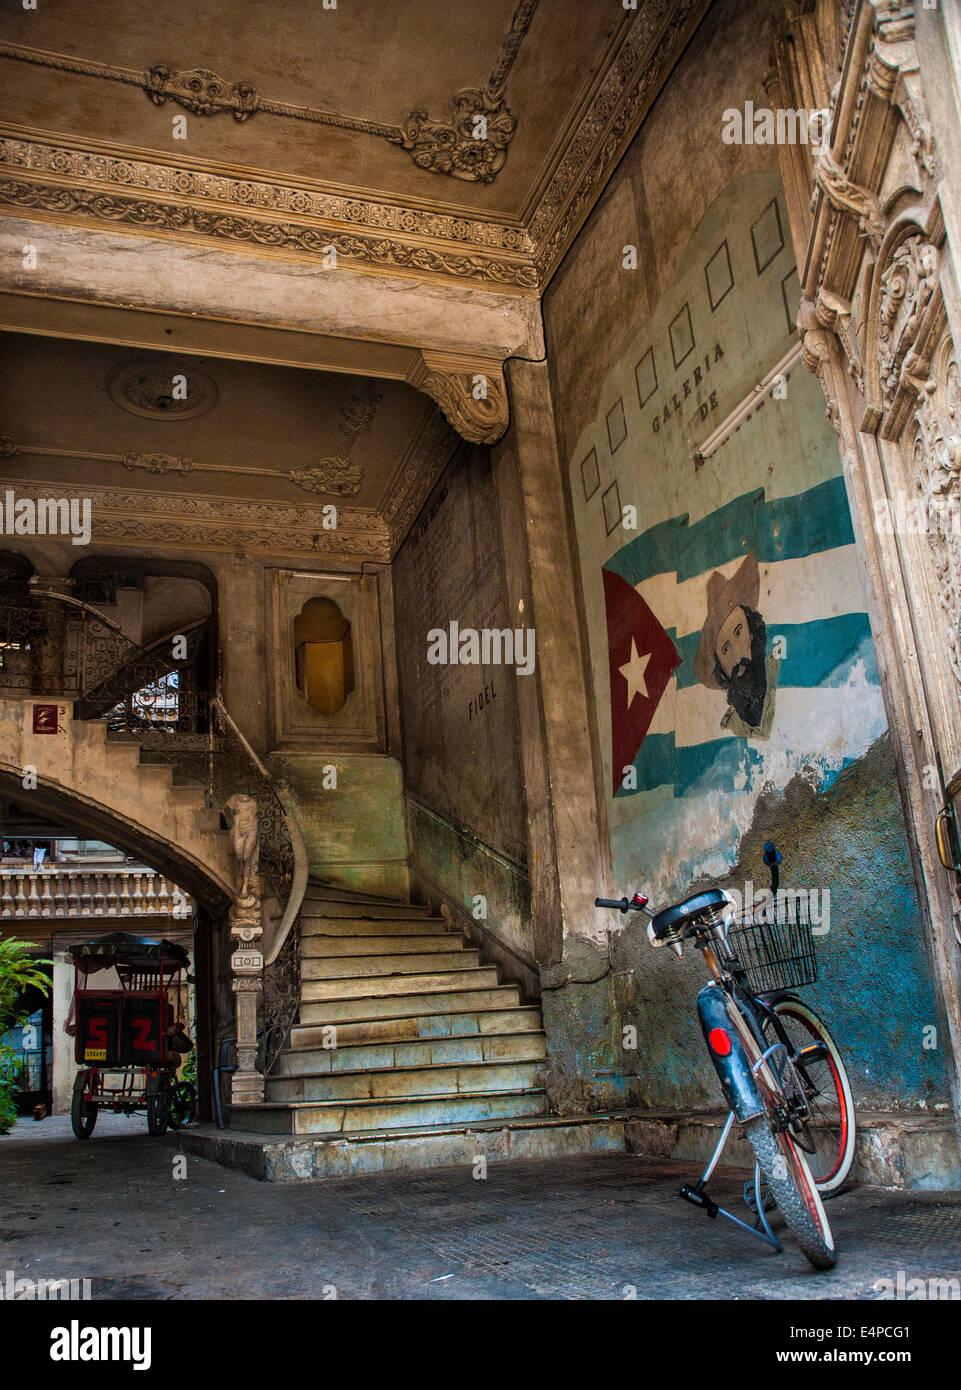 Entrance to La Guarida Restaurant in Havana, Cuba - Stock Image